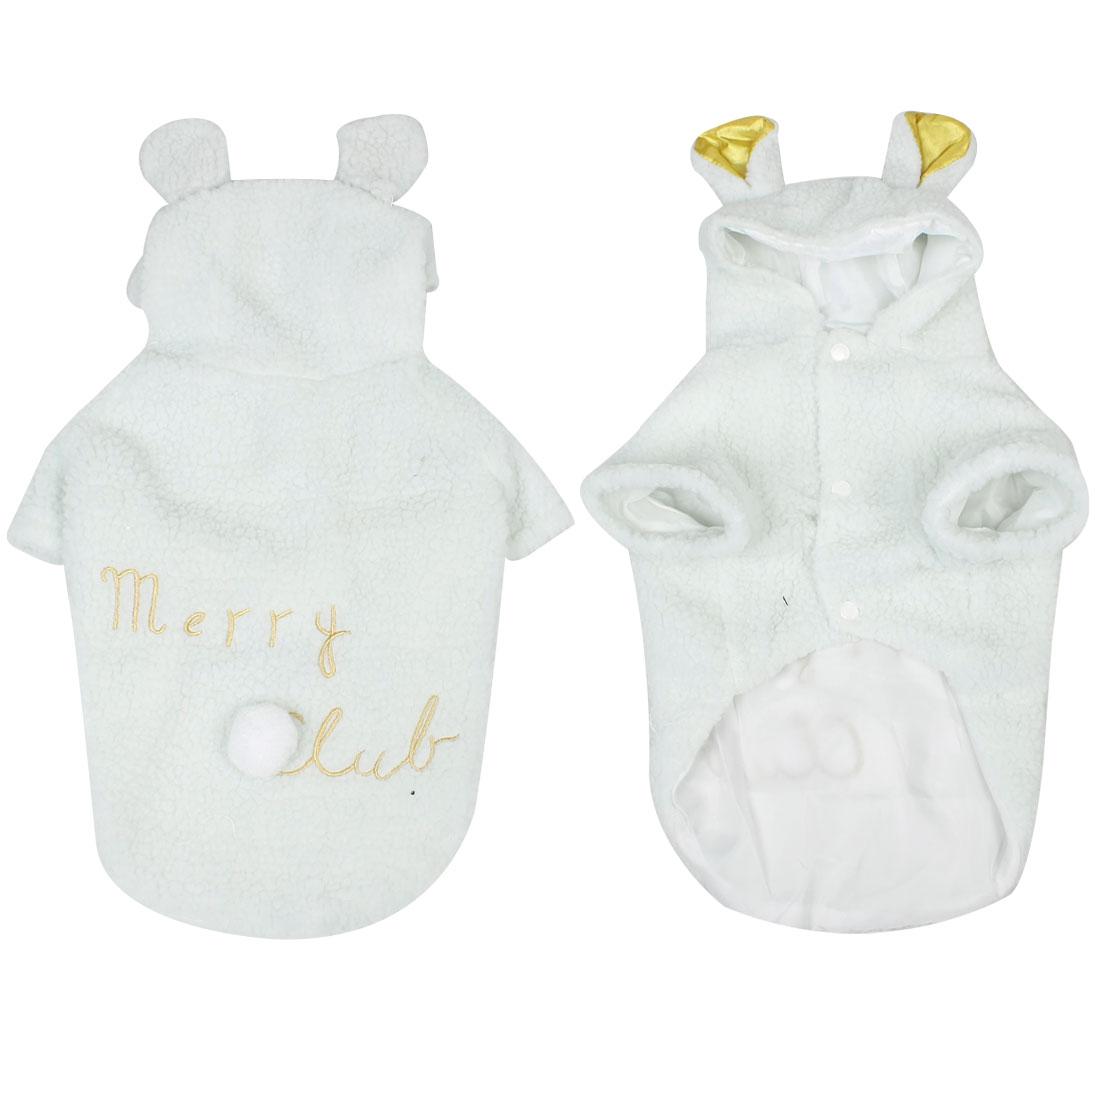 Winter Sheep Design Pet Dog Jacket Clothes Costume Apparel White L